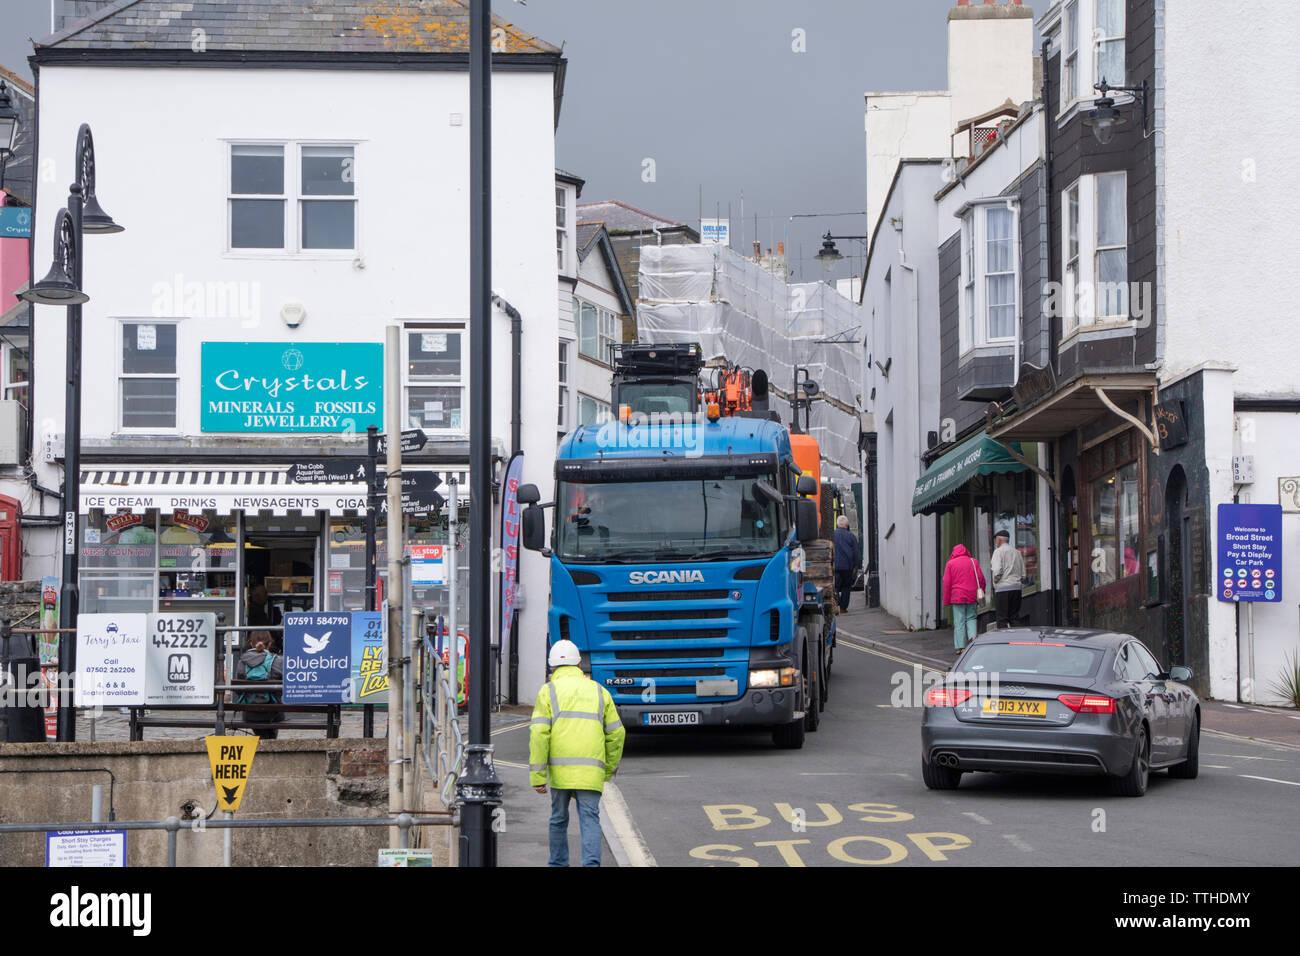 Heavy vehicles in the narrow streets of Lyme Regis, Dorset, England, UK - Stock Image